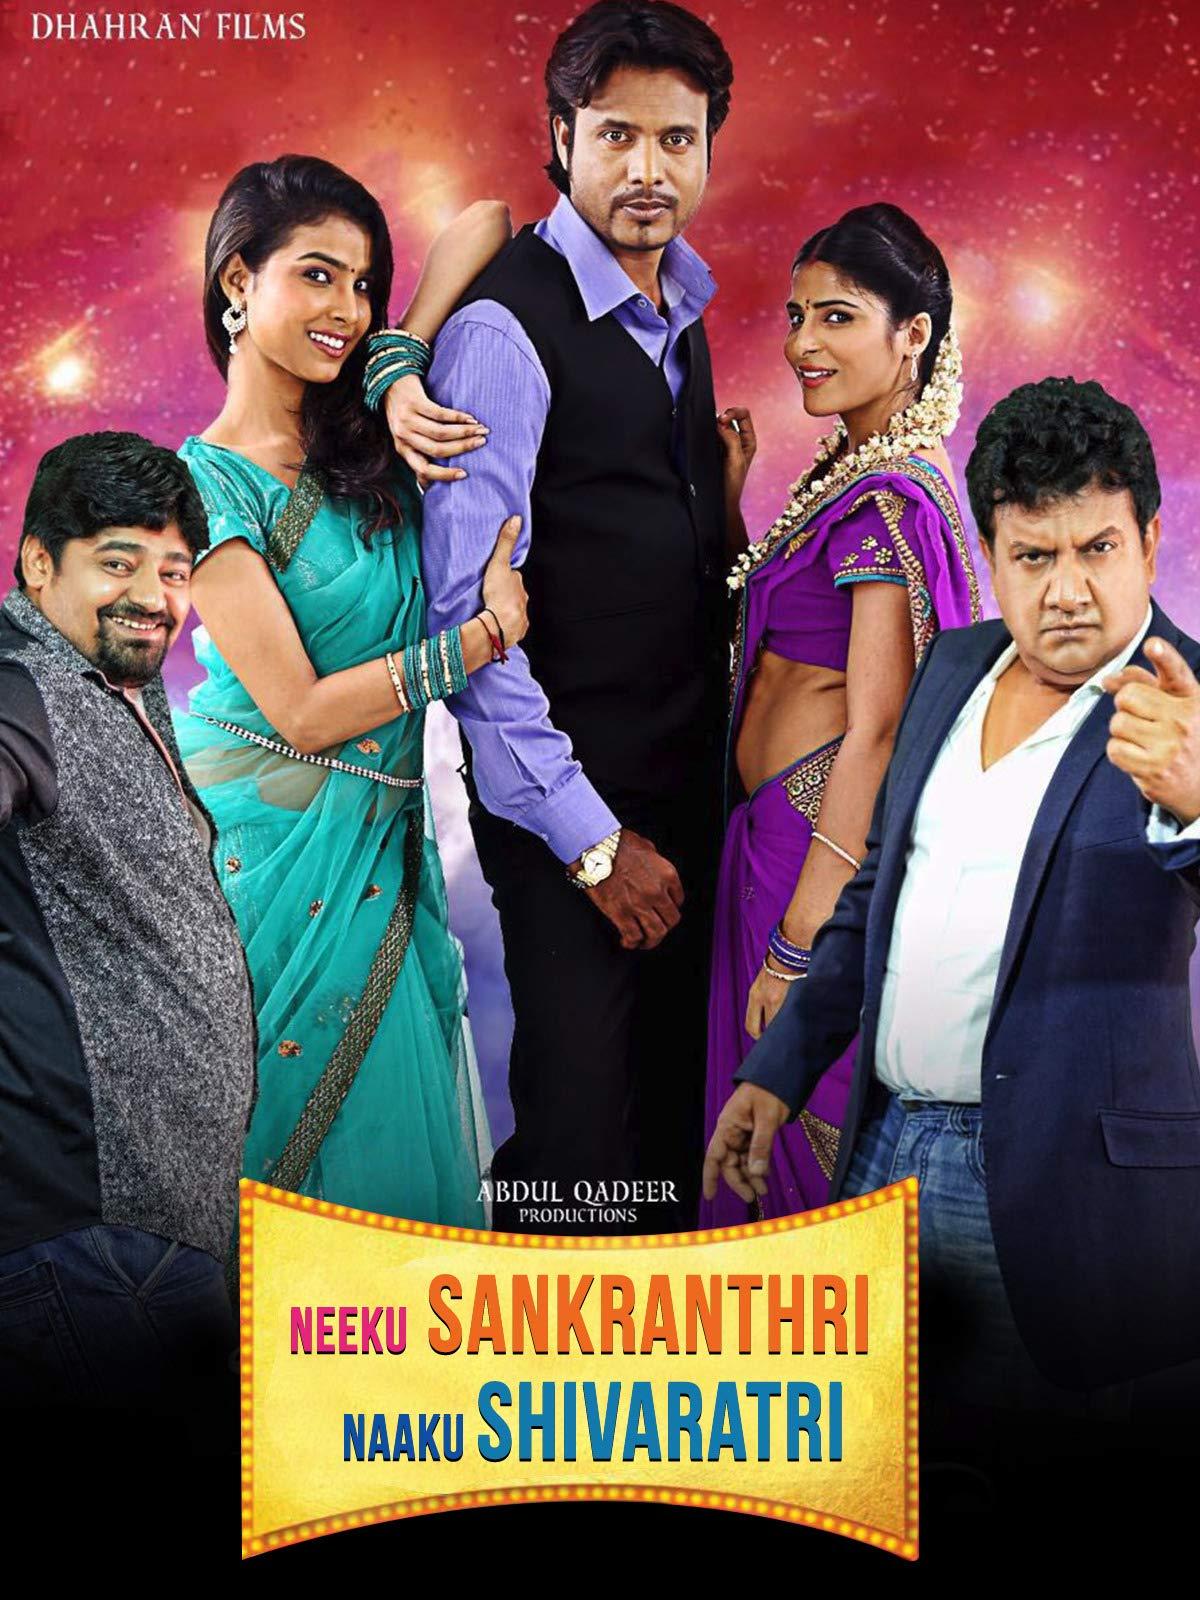 Neeku Sankranthri Naaku Shivaratri